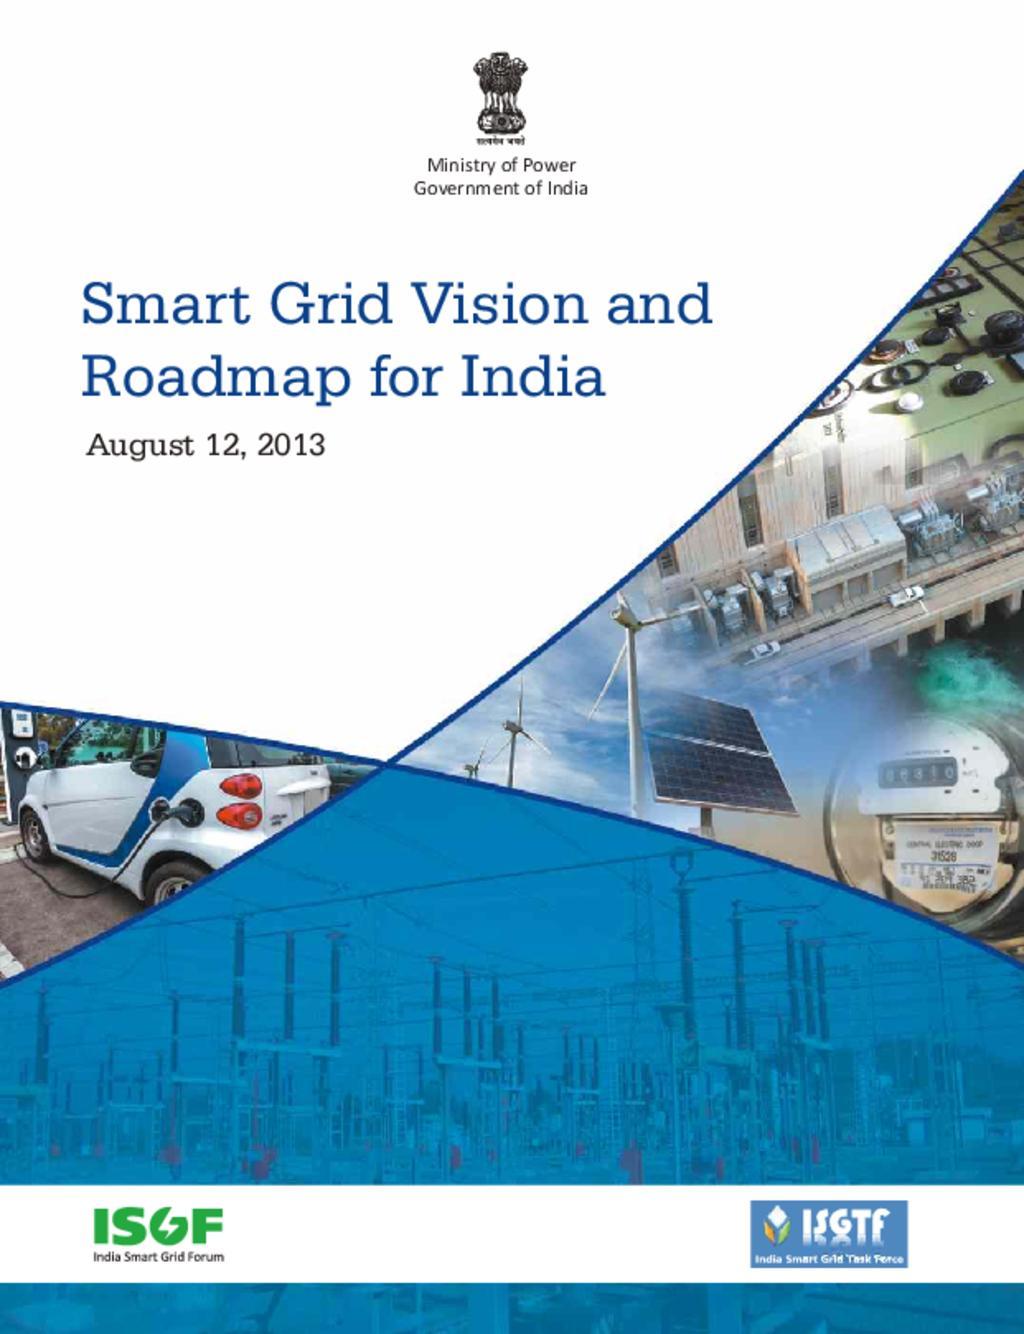 India Smart Grid